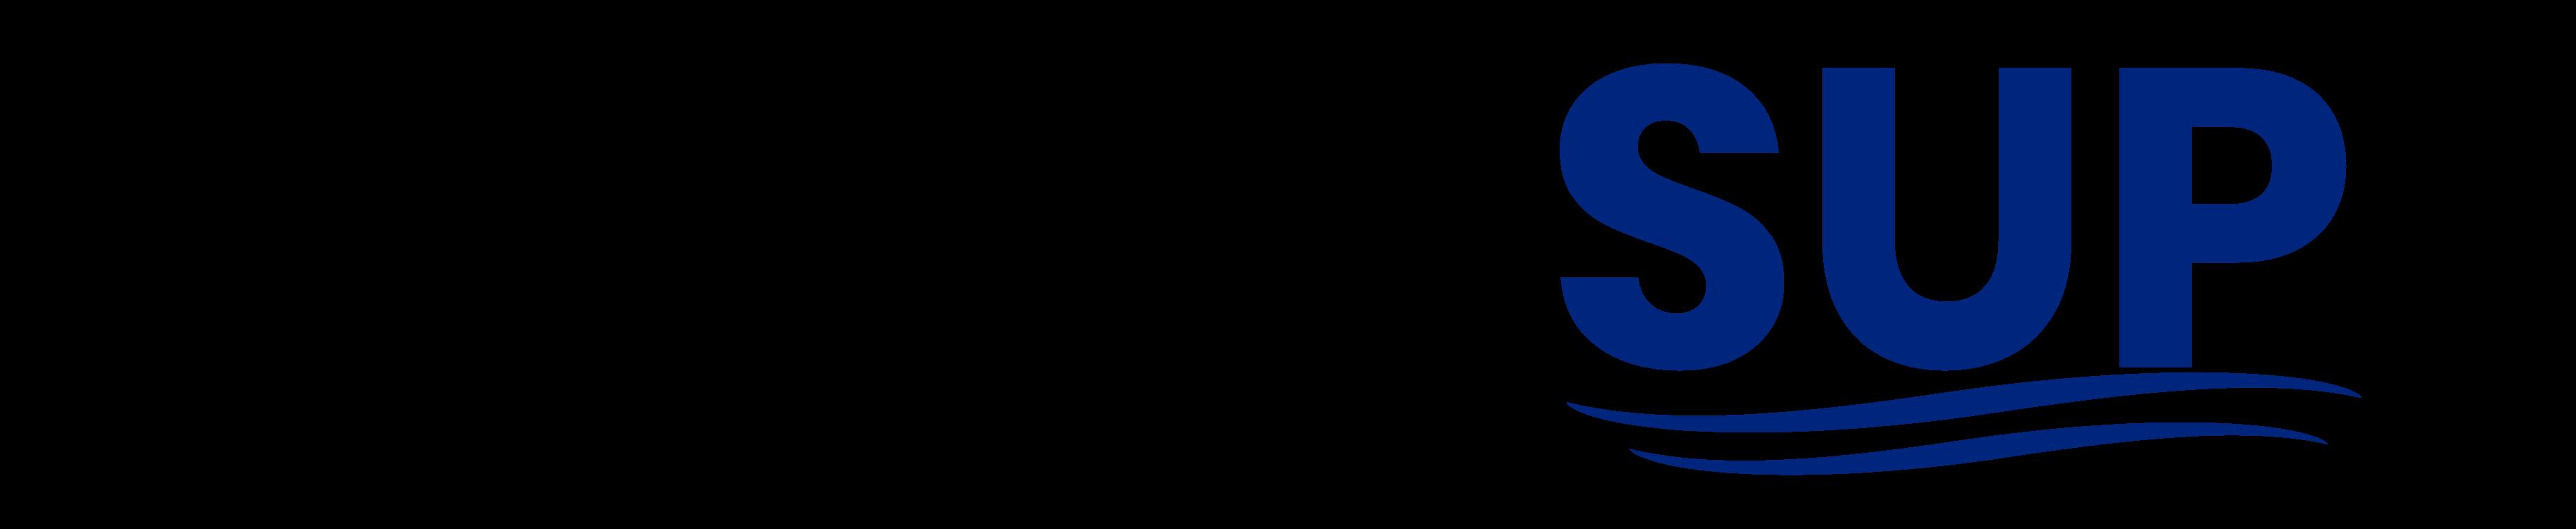 NeckarSUP